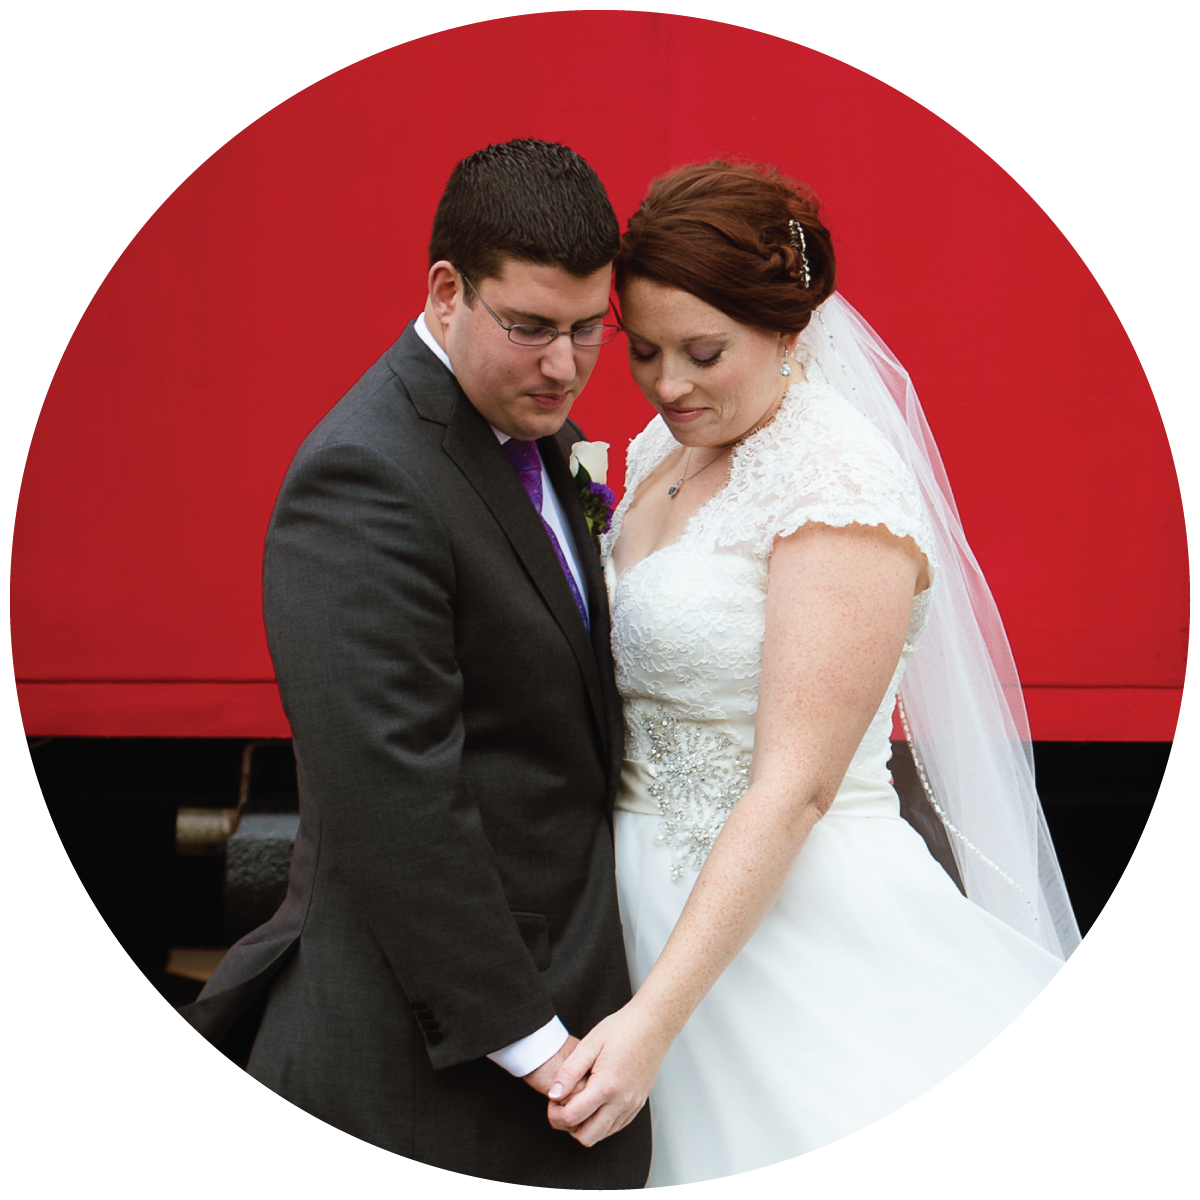 Courtney Lock and Co. Traci JD Medlock Washington DC Wedding Portrait Music Photography Videography Lifestyle Photographers Virginia Testimonial